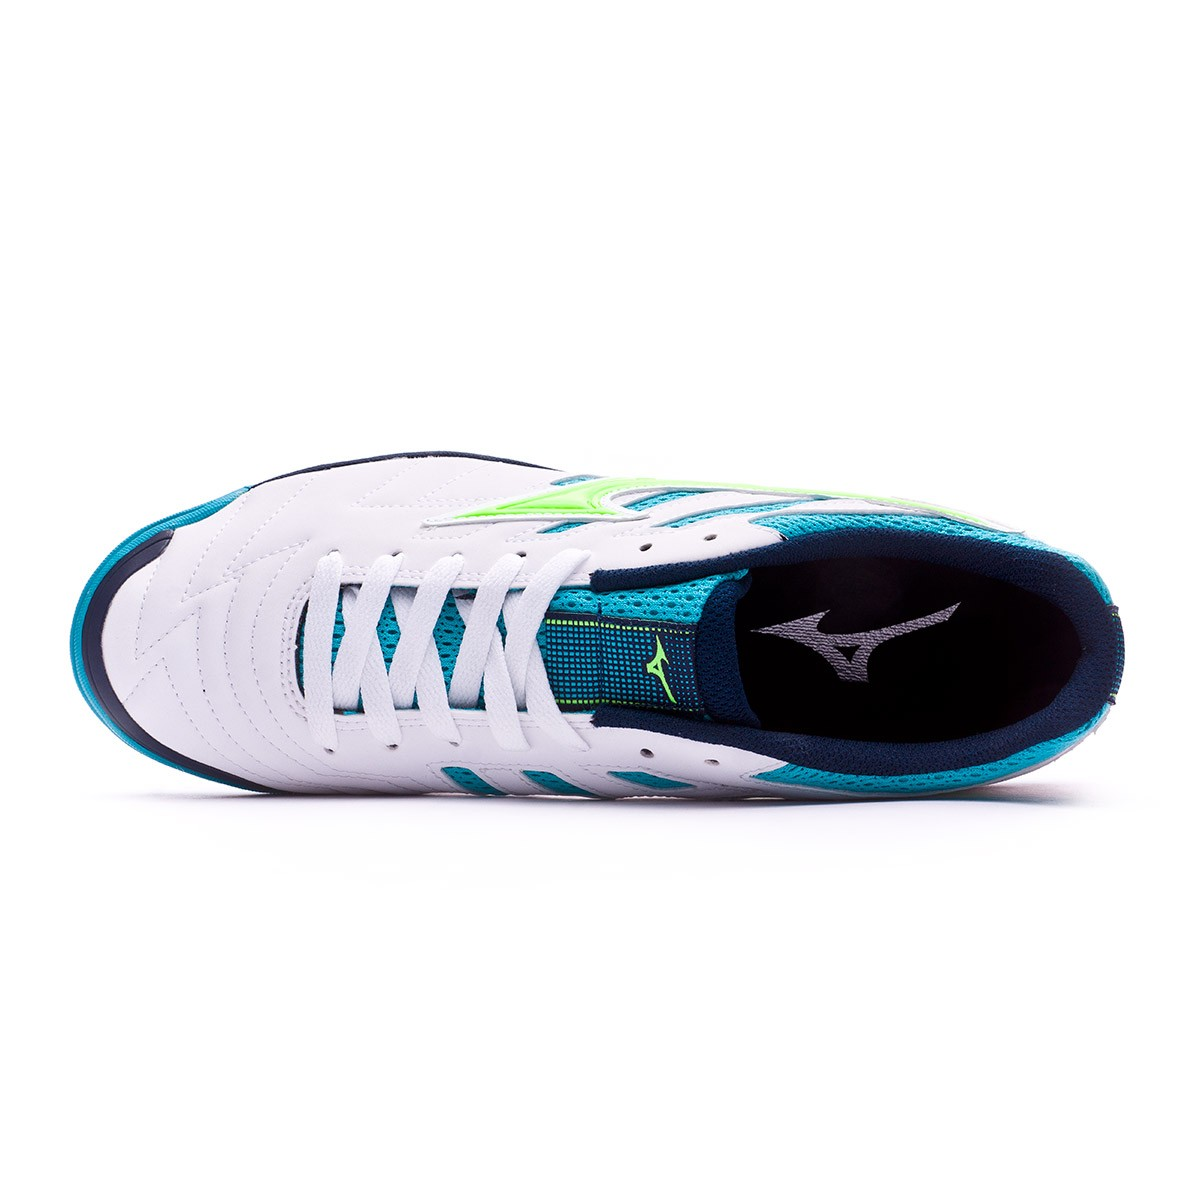 ce6637ed8497 Futsal Boot Mizuno Sala Classic 2 AS White-Green-Pea cock blue - Tienda de fútbol  Fútbol Emotion